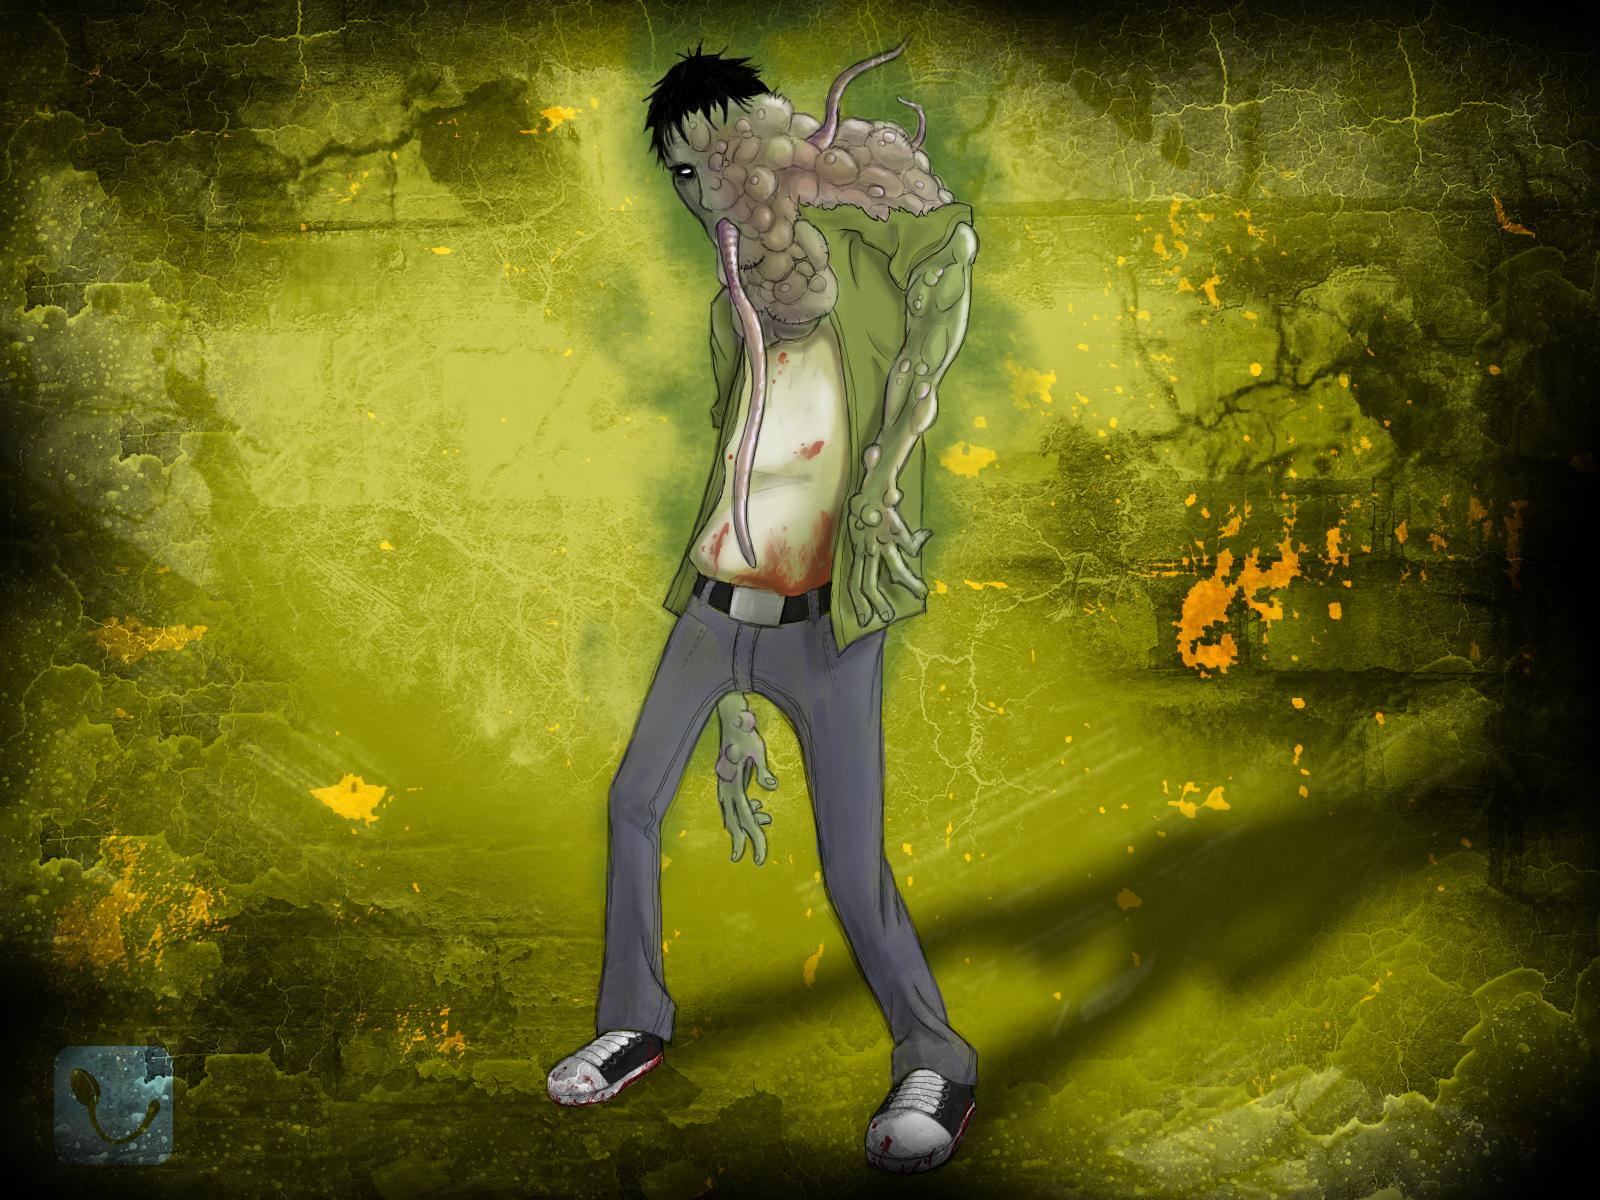 Smoker's mutation